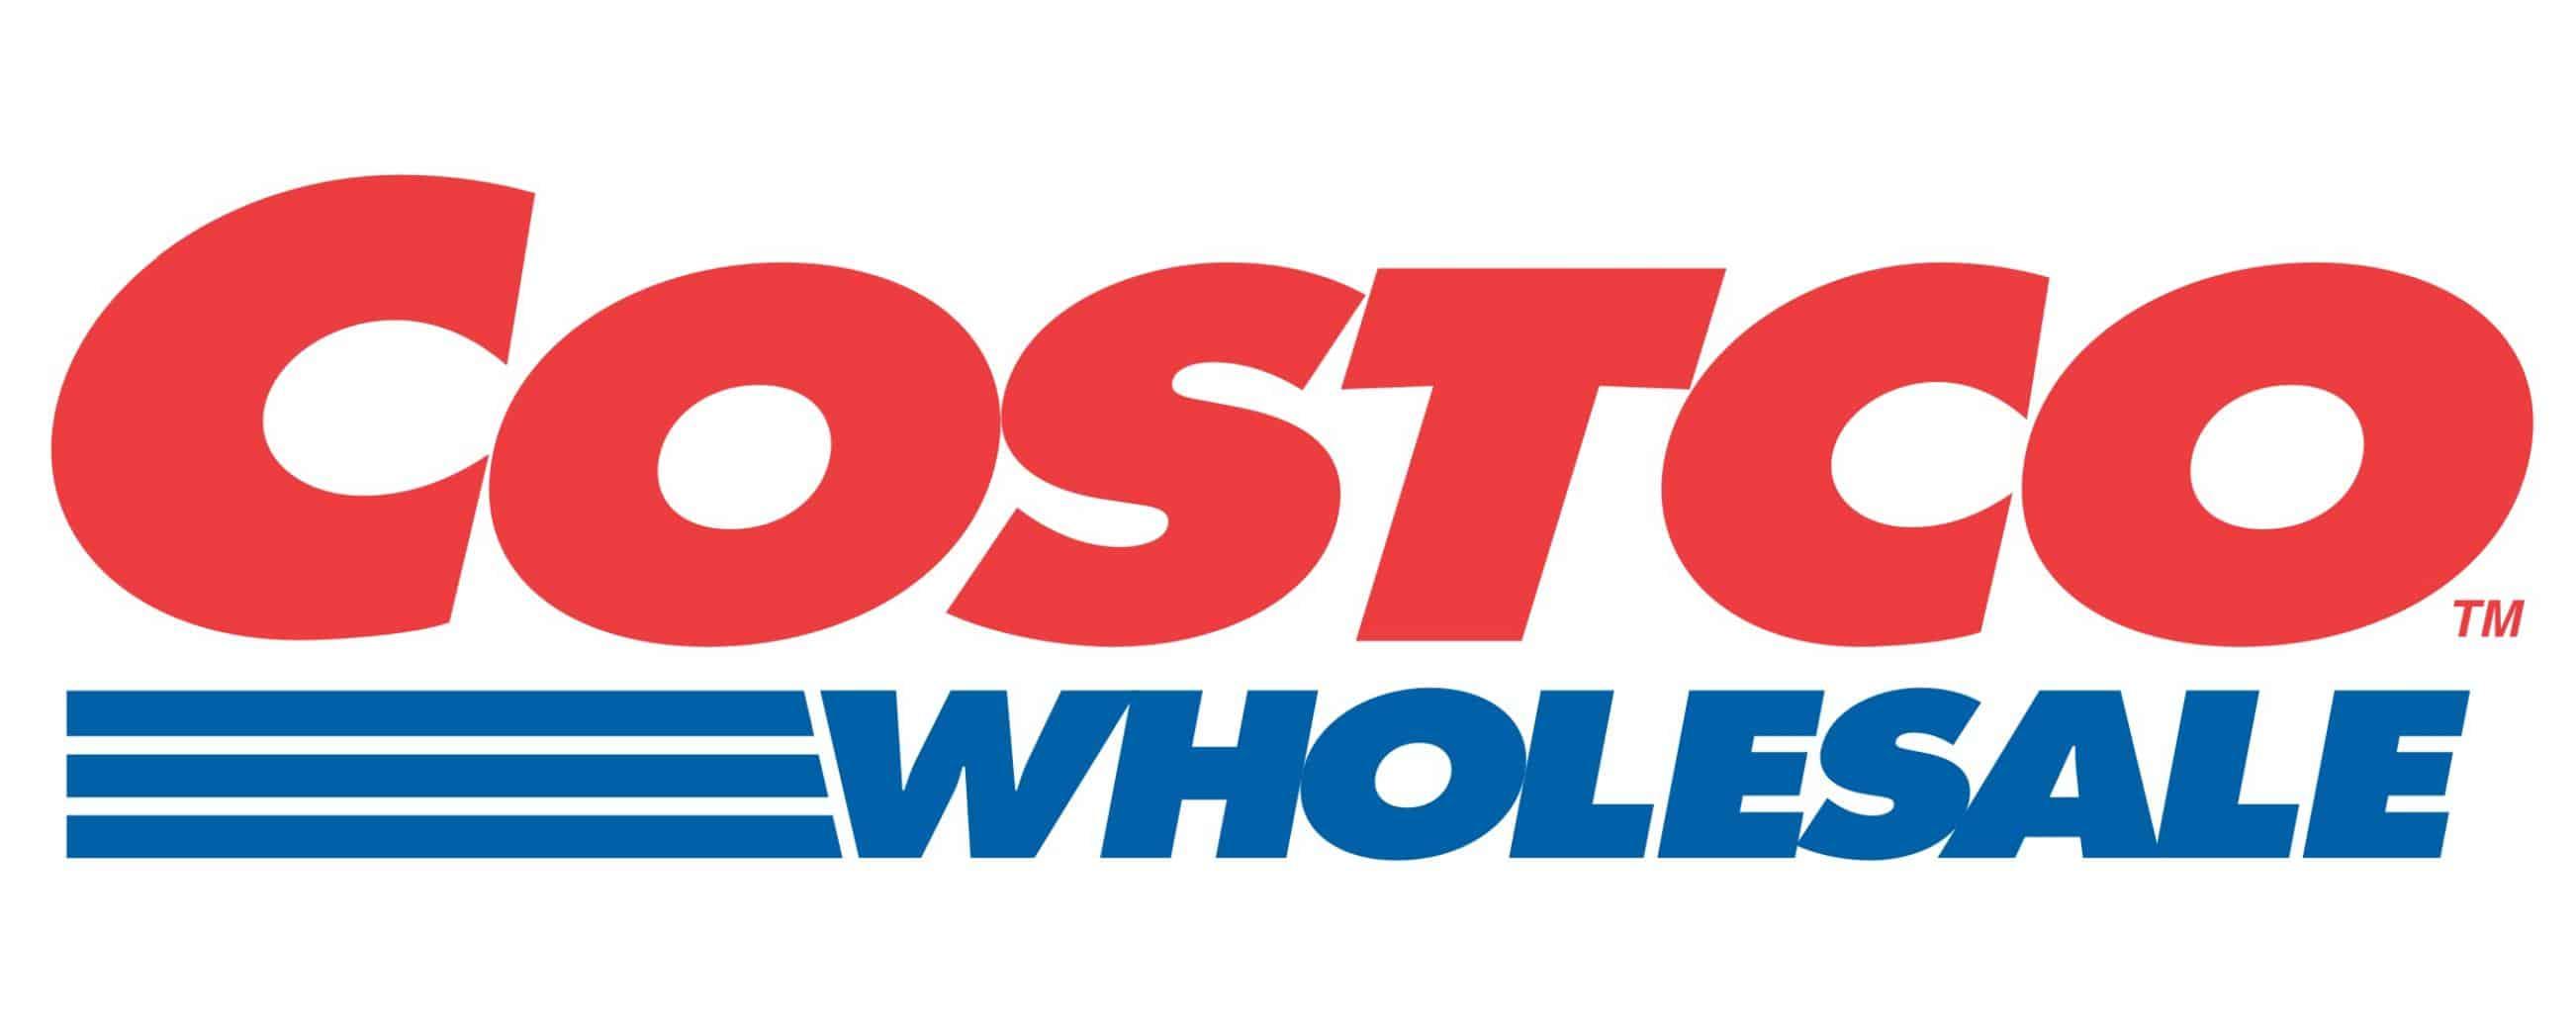 costco wholesale-logo